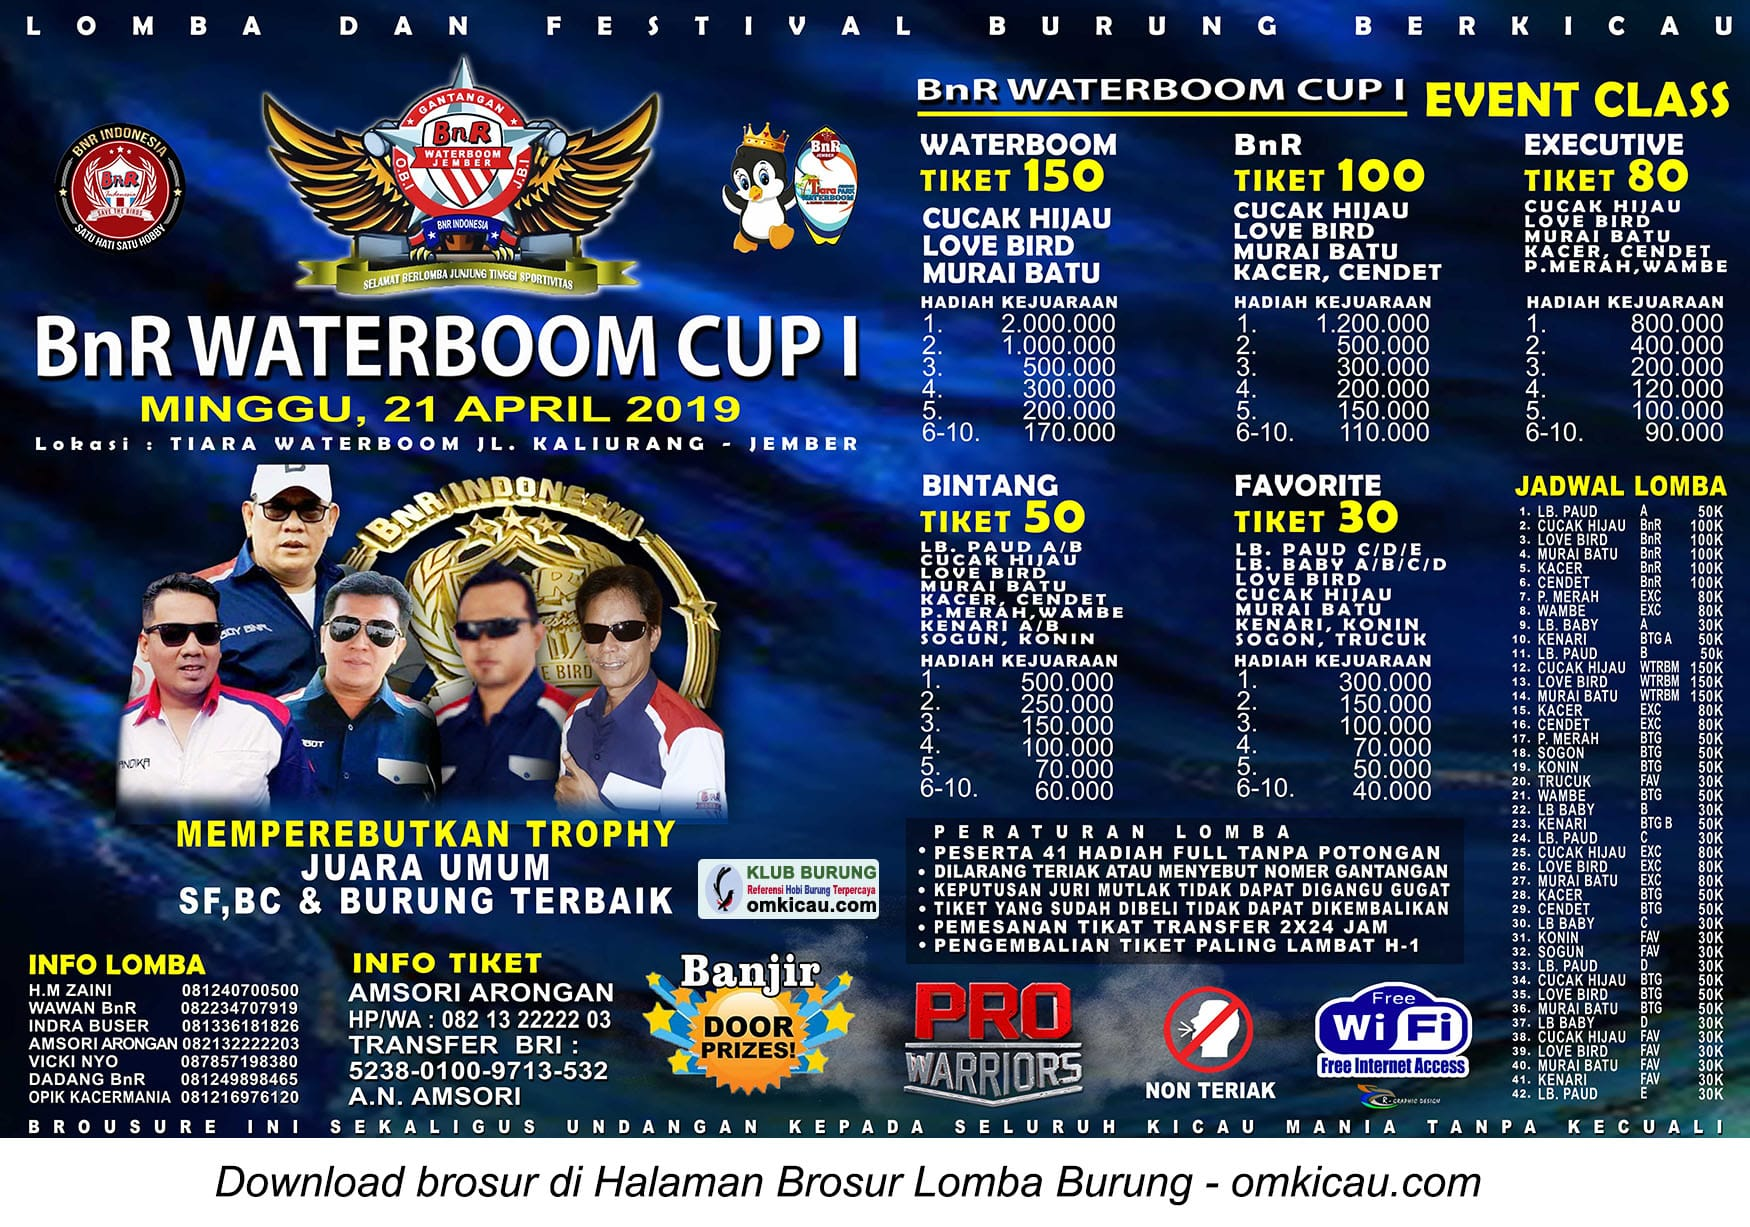 BnR Waterboom Cup I